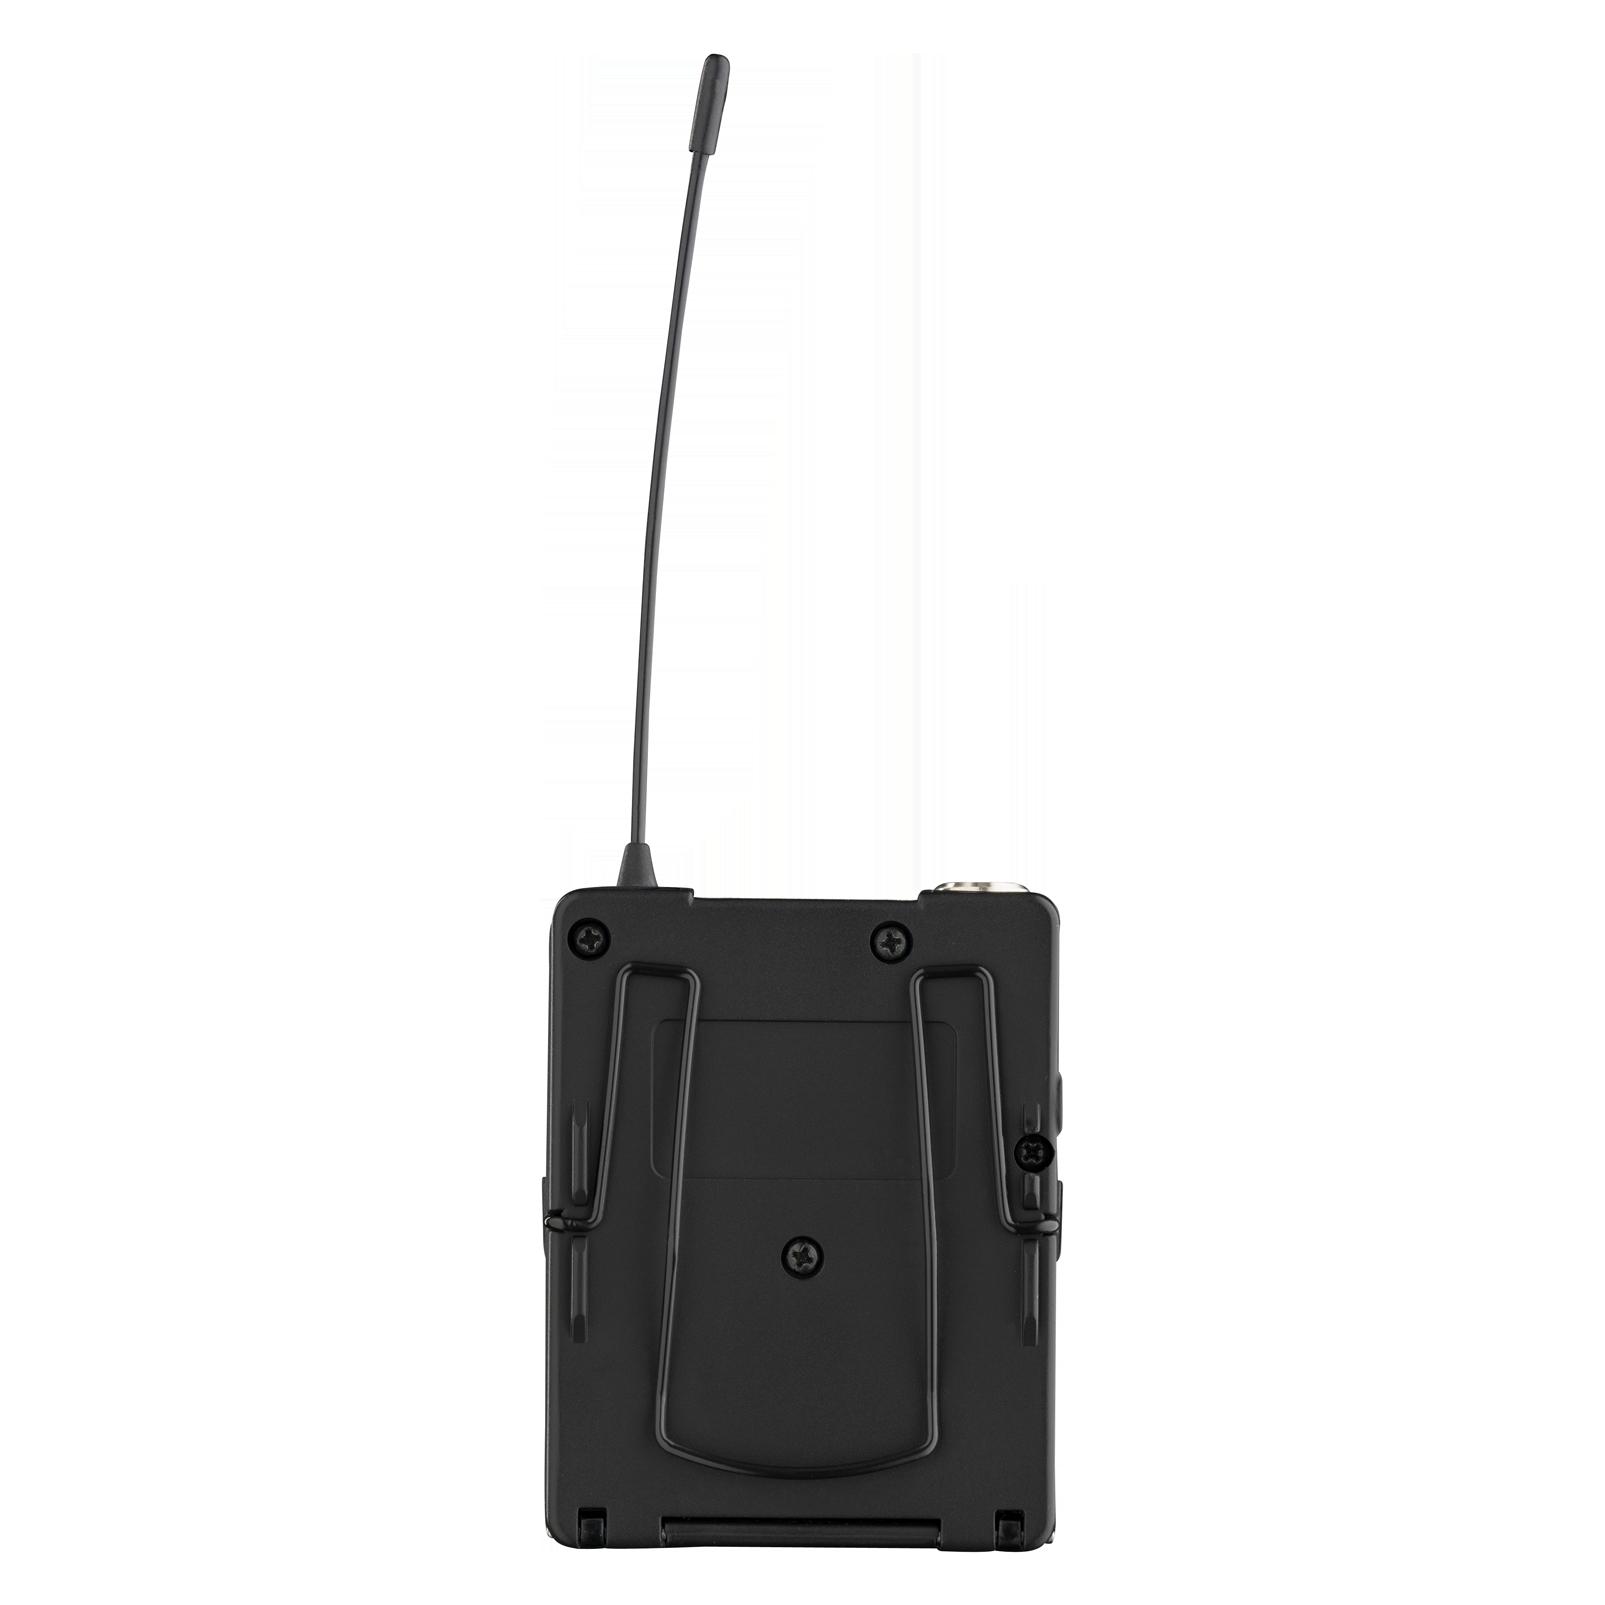 DPT800 Band1 50mW (B-Stock) - Black - Reference digital wireless body pack transmitter - Back